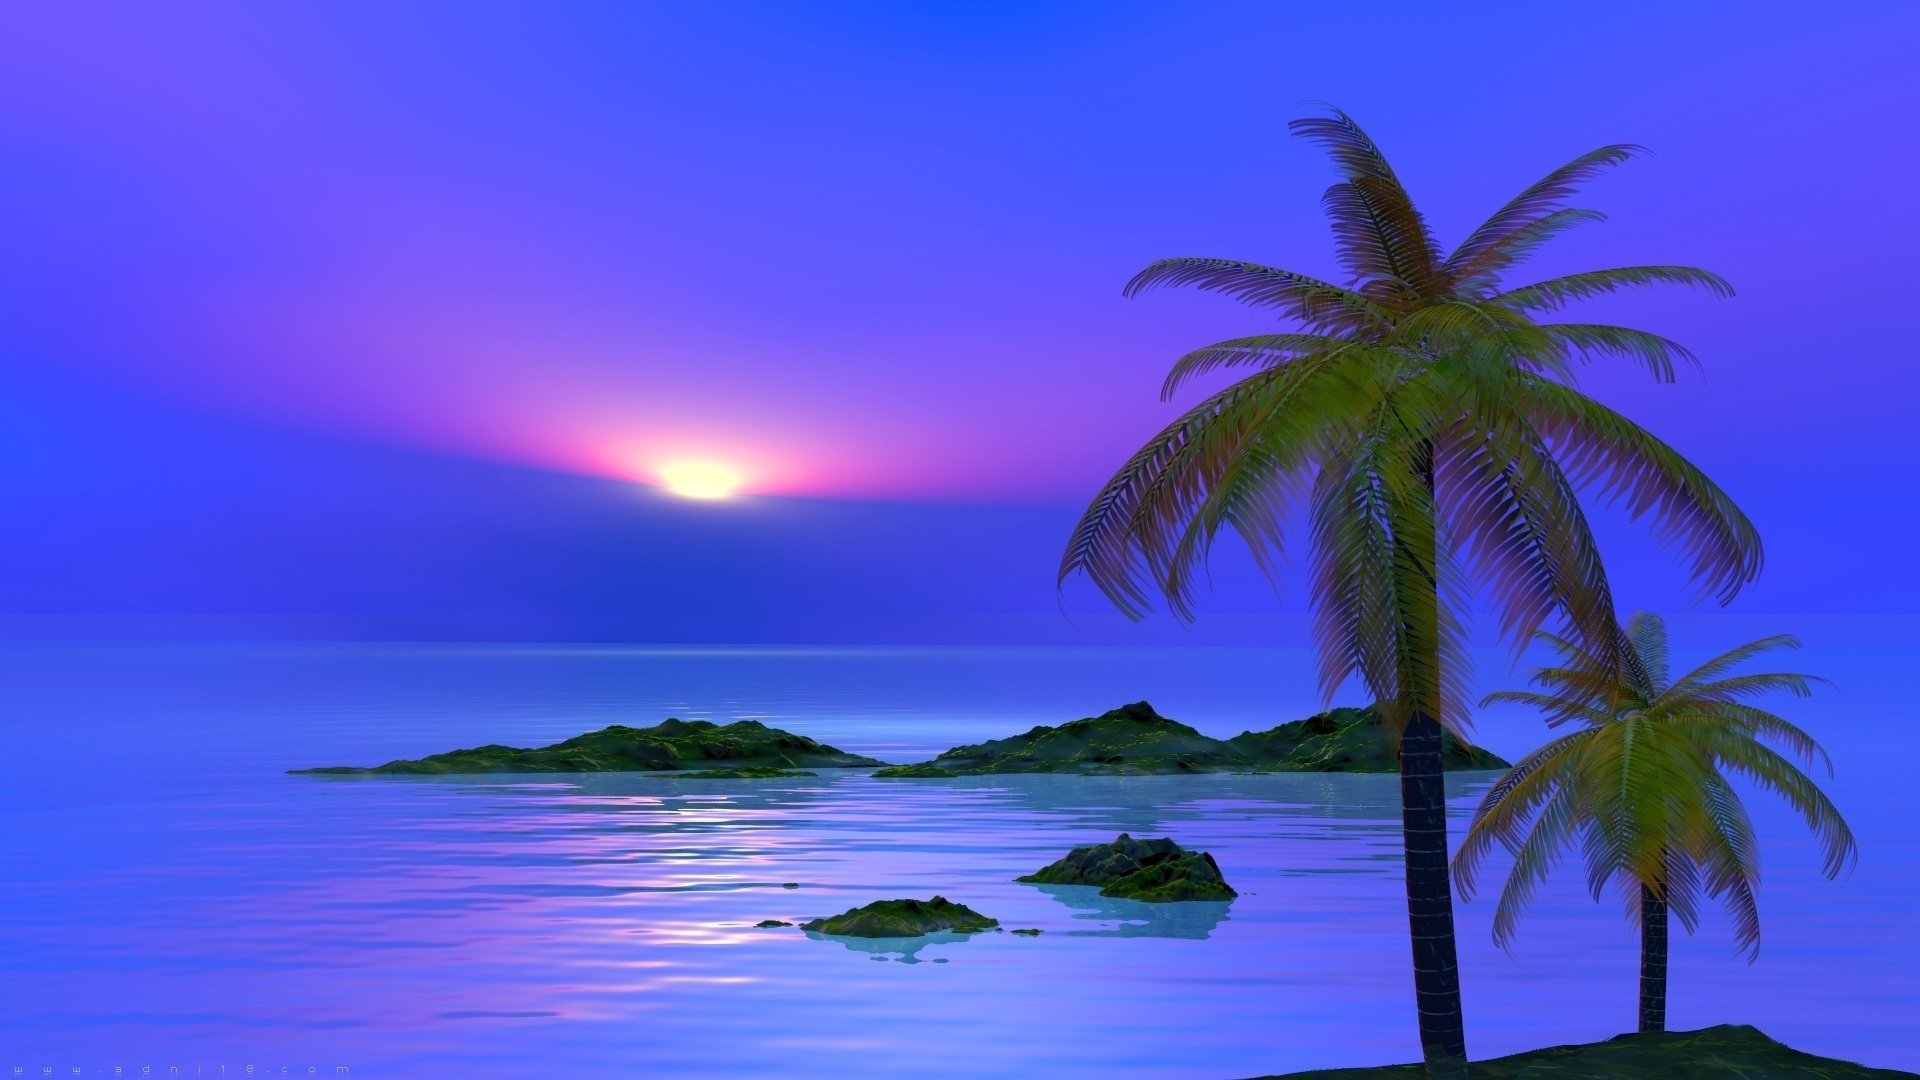 Fabulous Sunset wallpaper